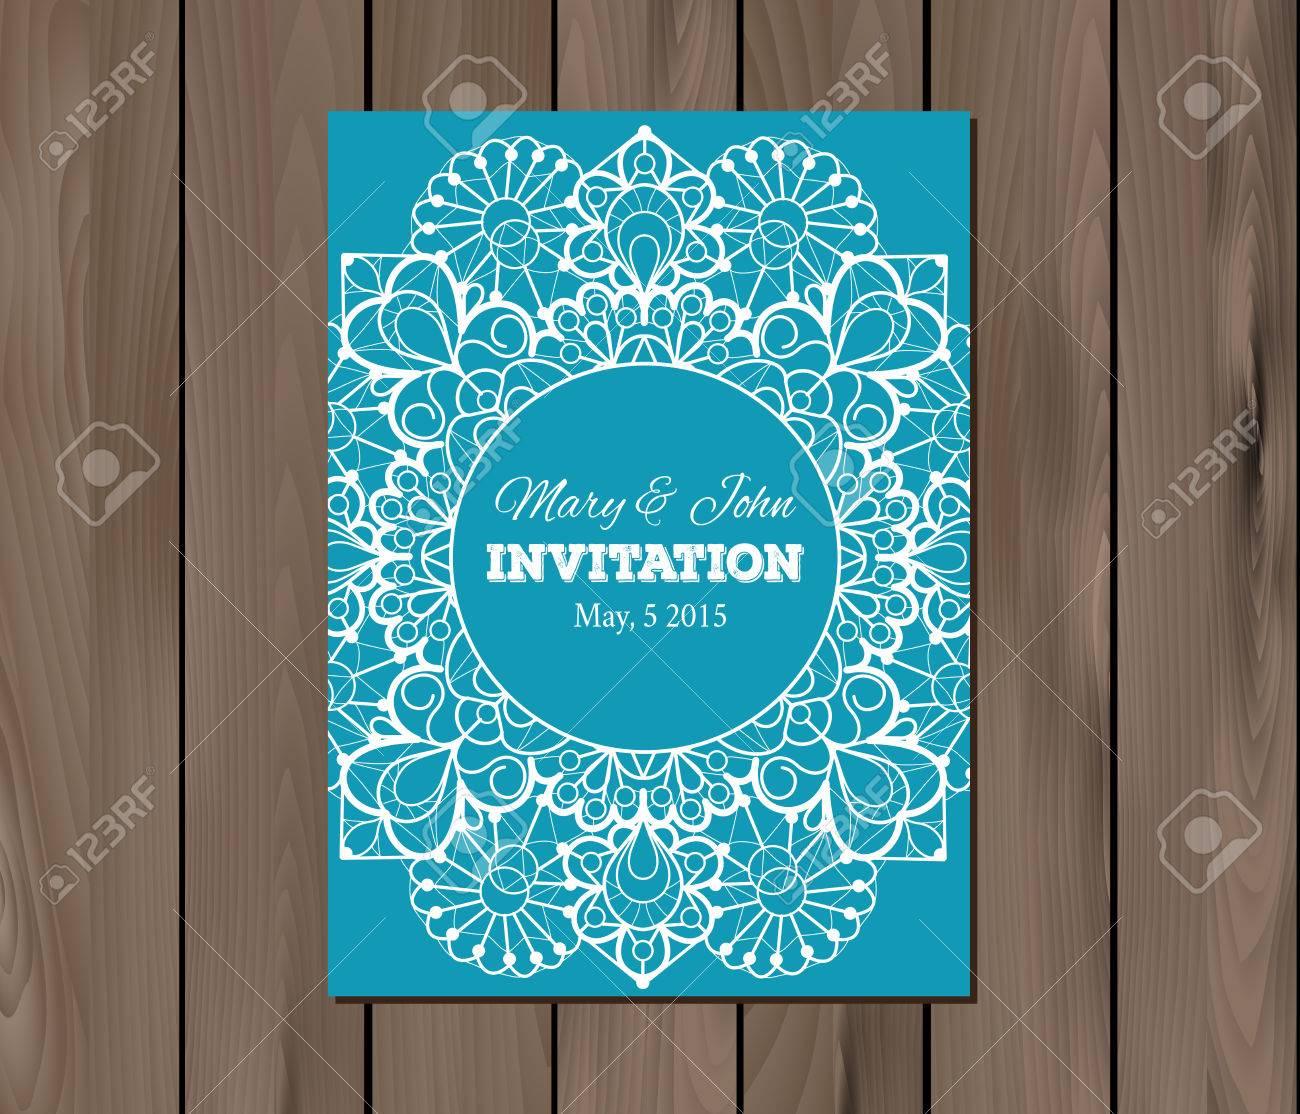 Wedding invitation card template on a wooden background vintage wedding invitation card template on a wooden background vintage lace design eps 10 stopboris Choice Image